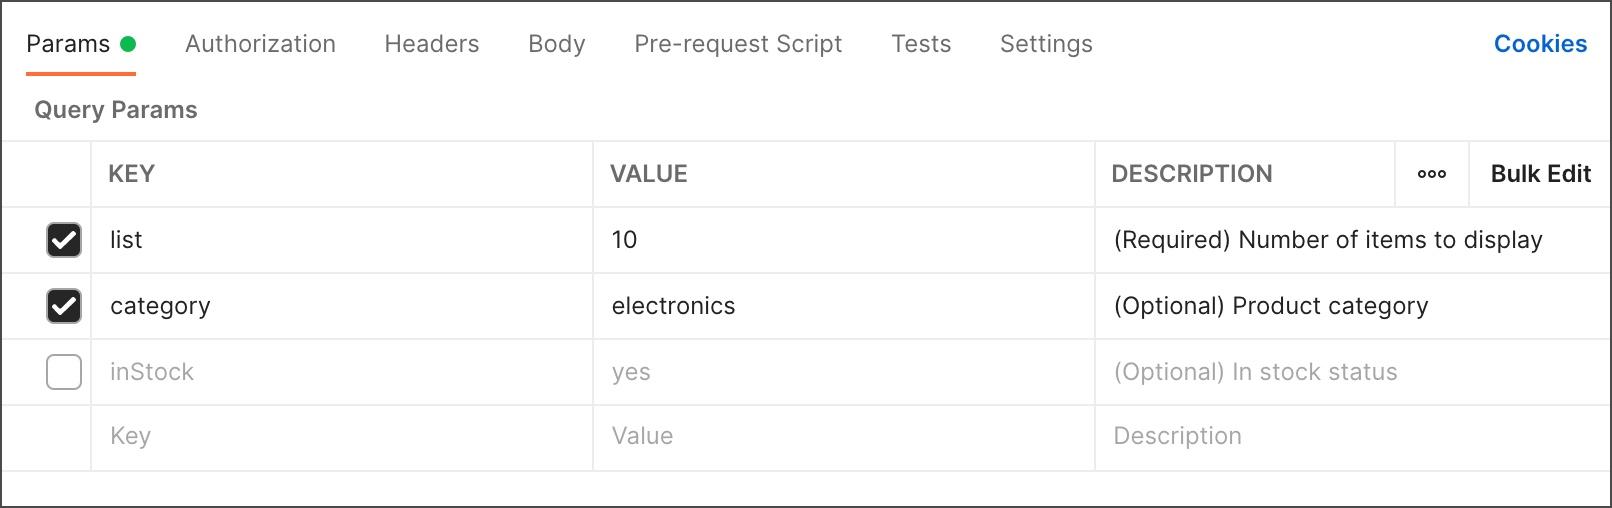 Parameter descriptions